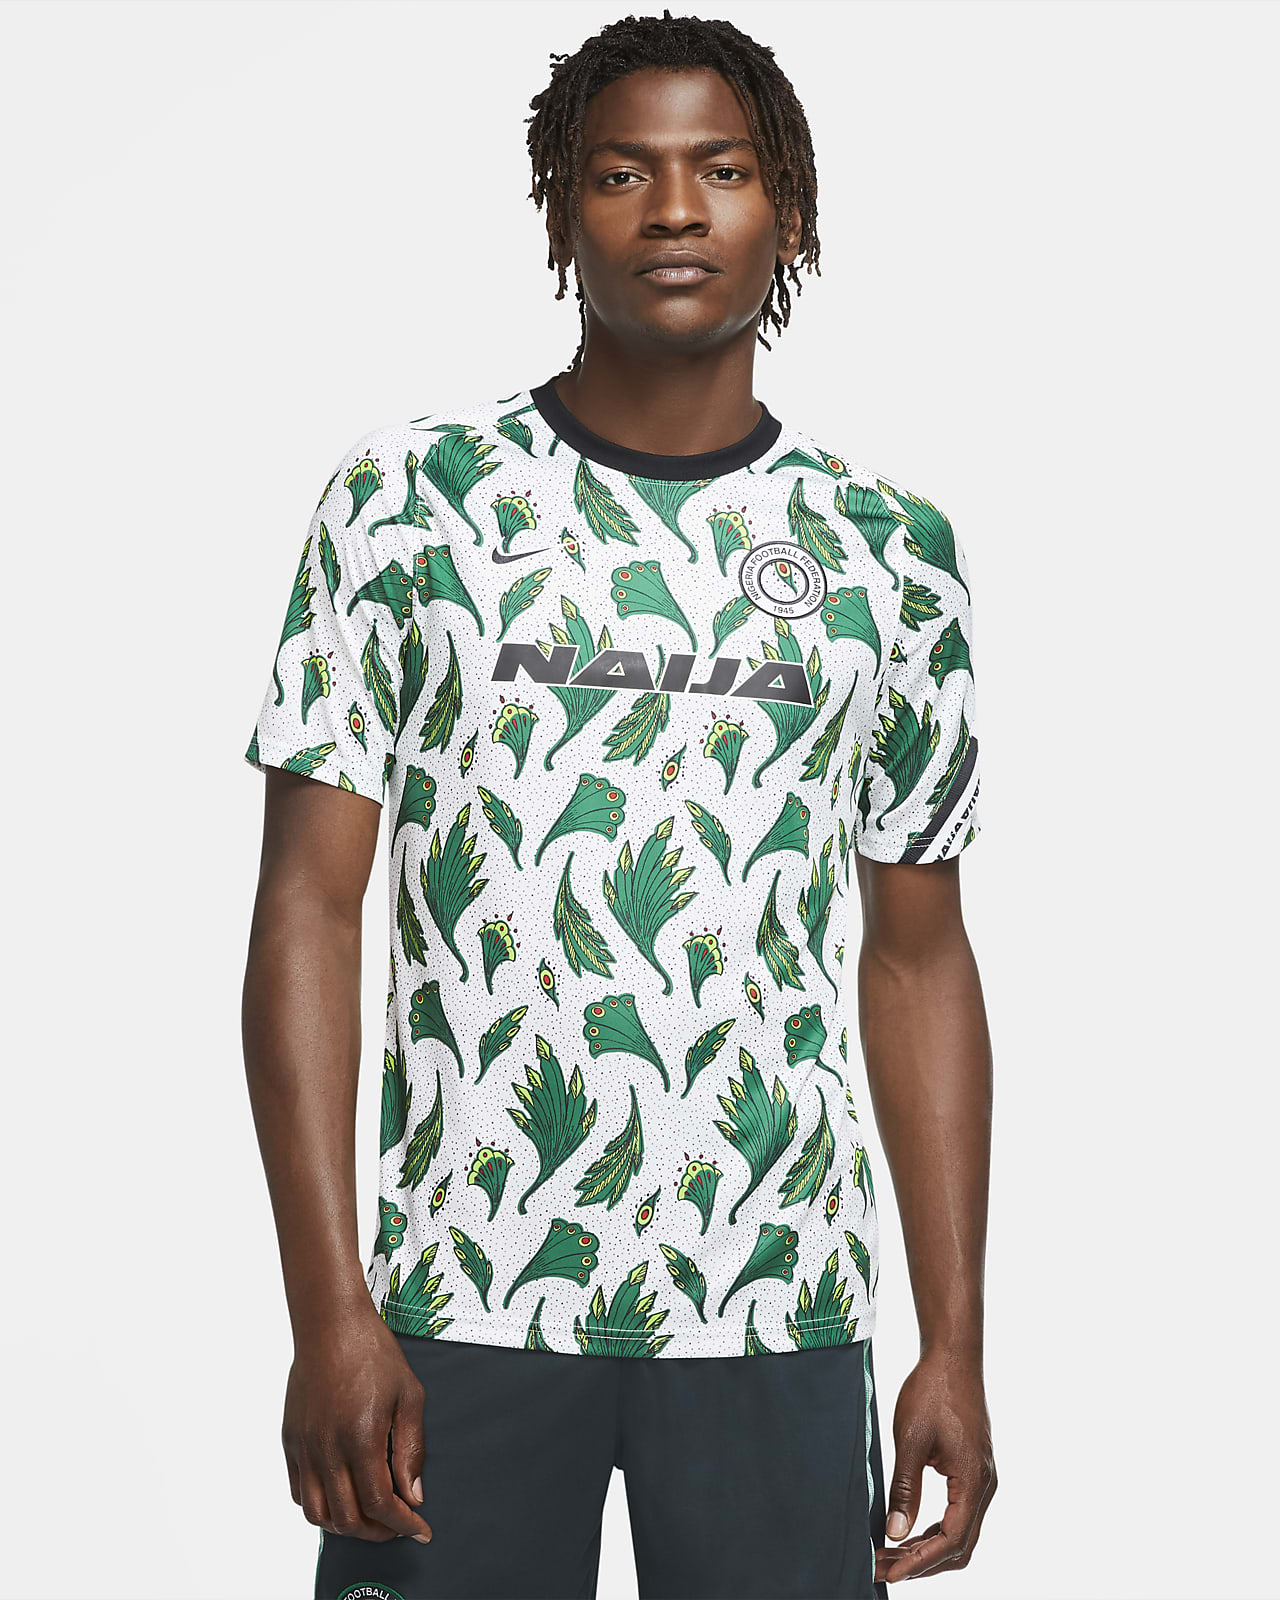 Nigeria Men's Pre-Match Short-Sleeve Soccer Top